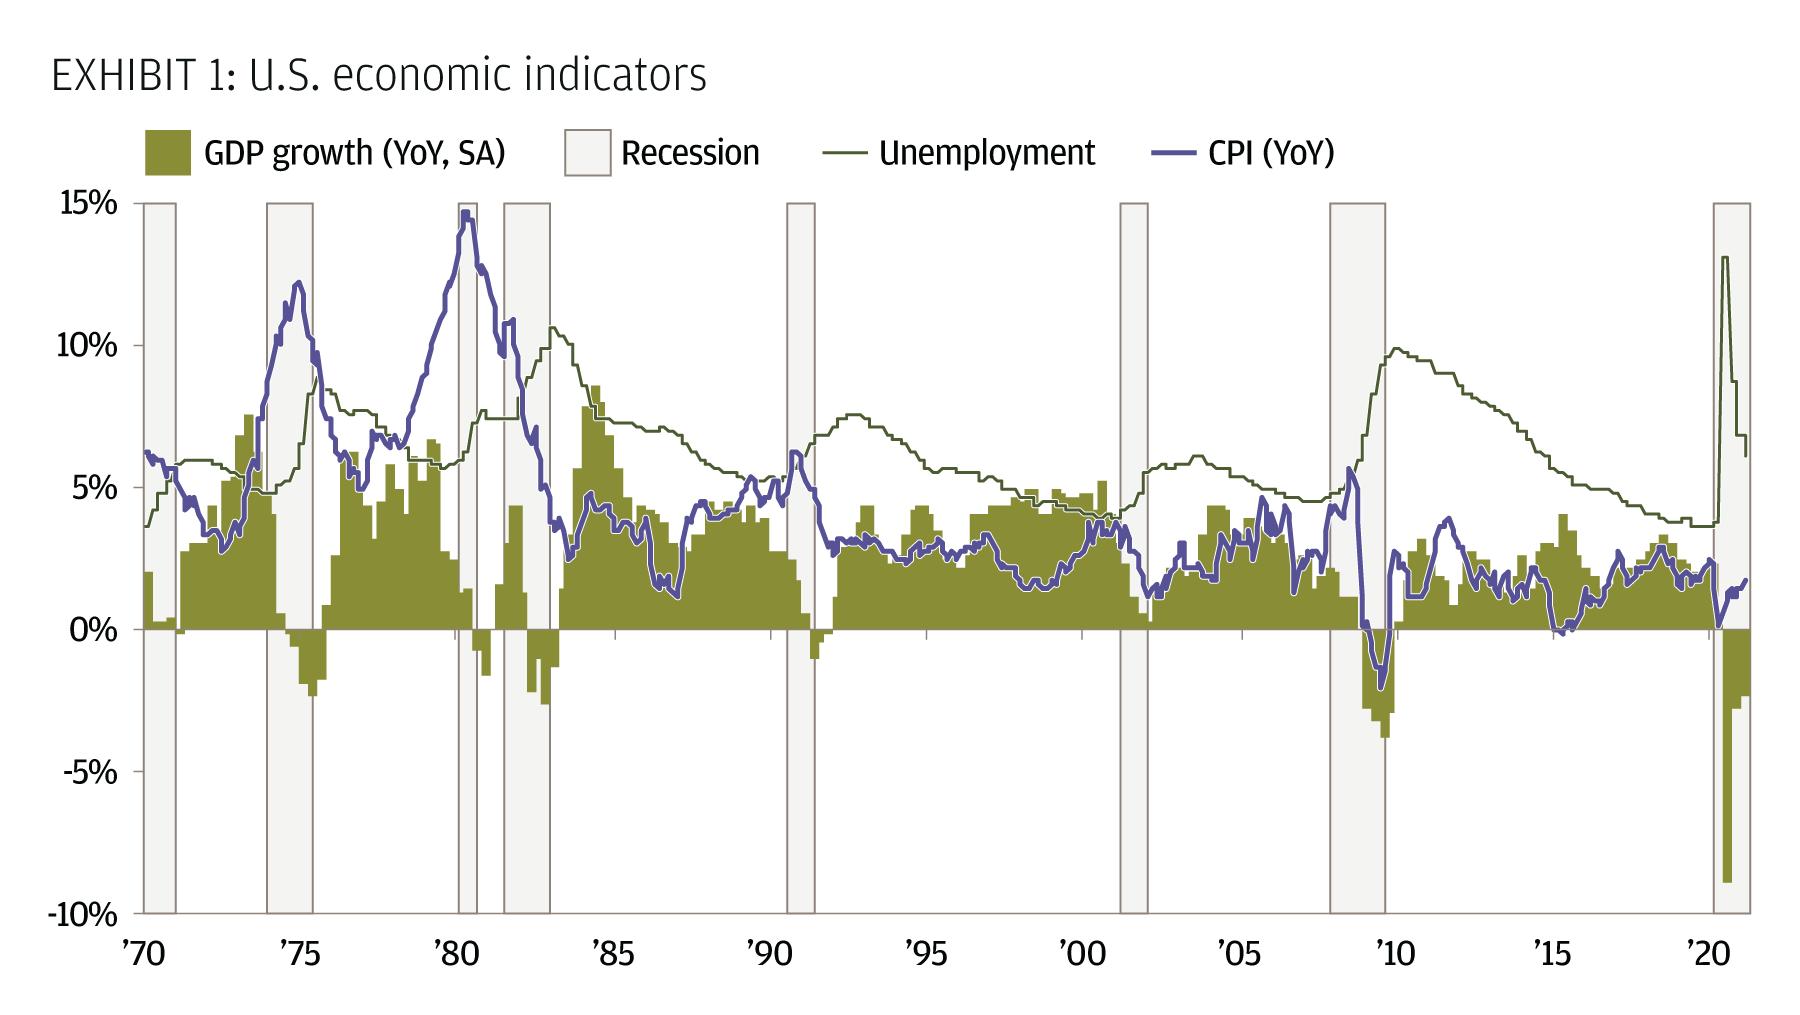 U.S. economic indicators